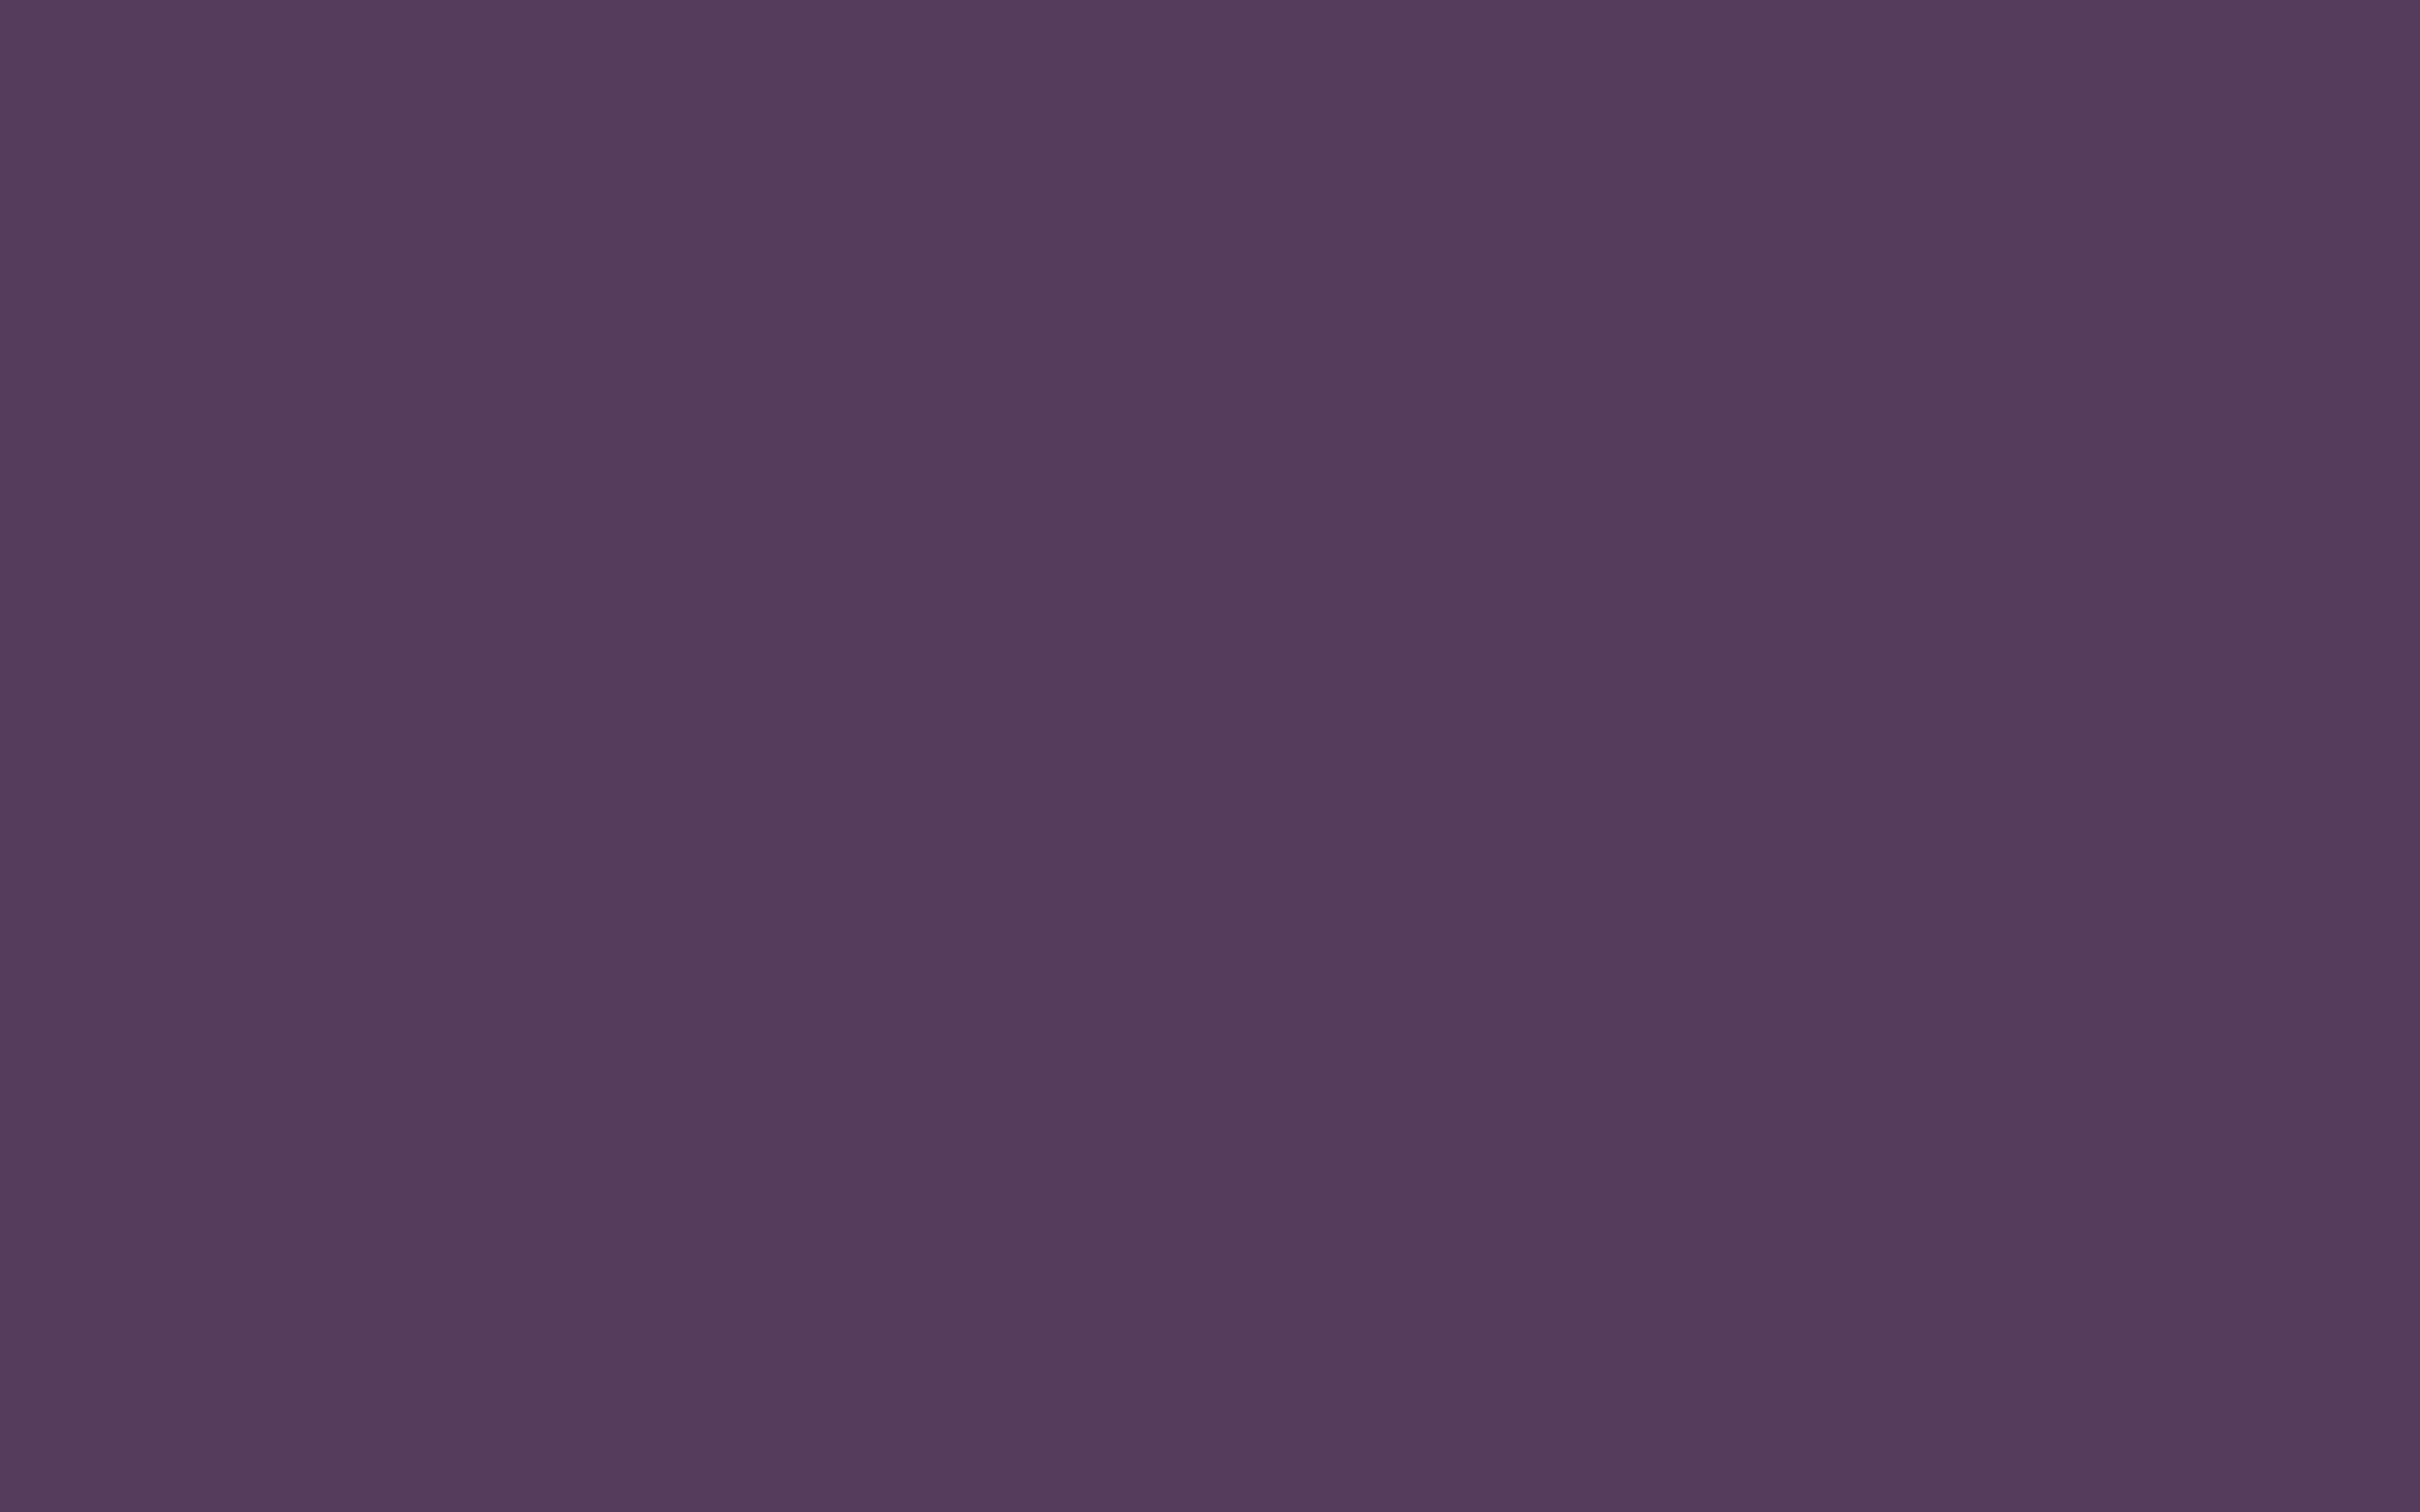 2560x1600 English Violet Solid Color Background